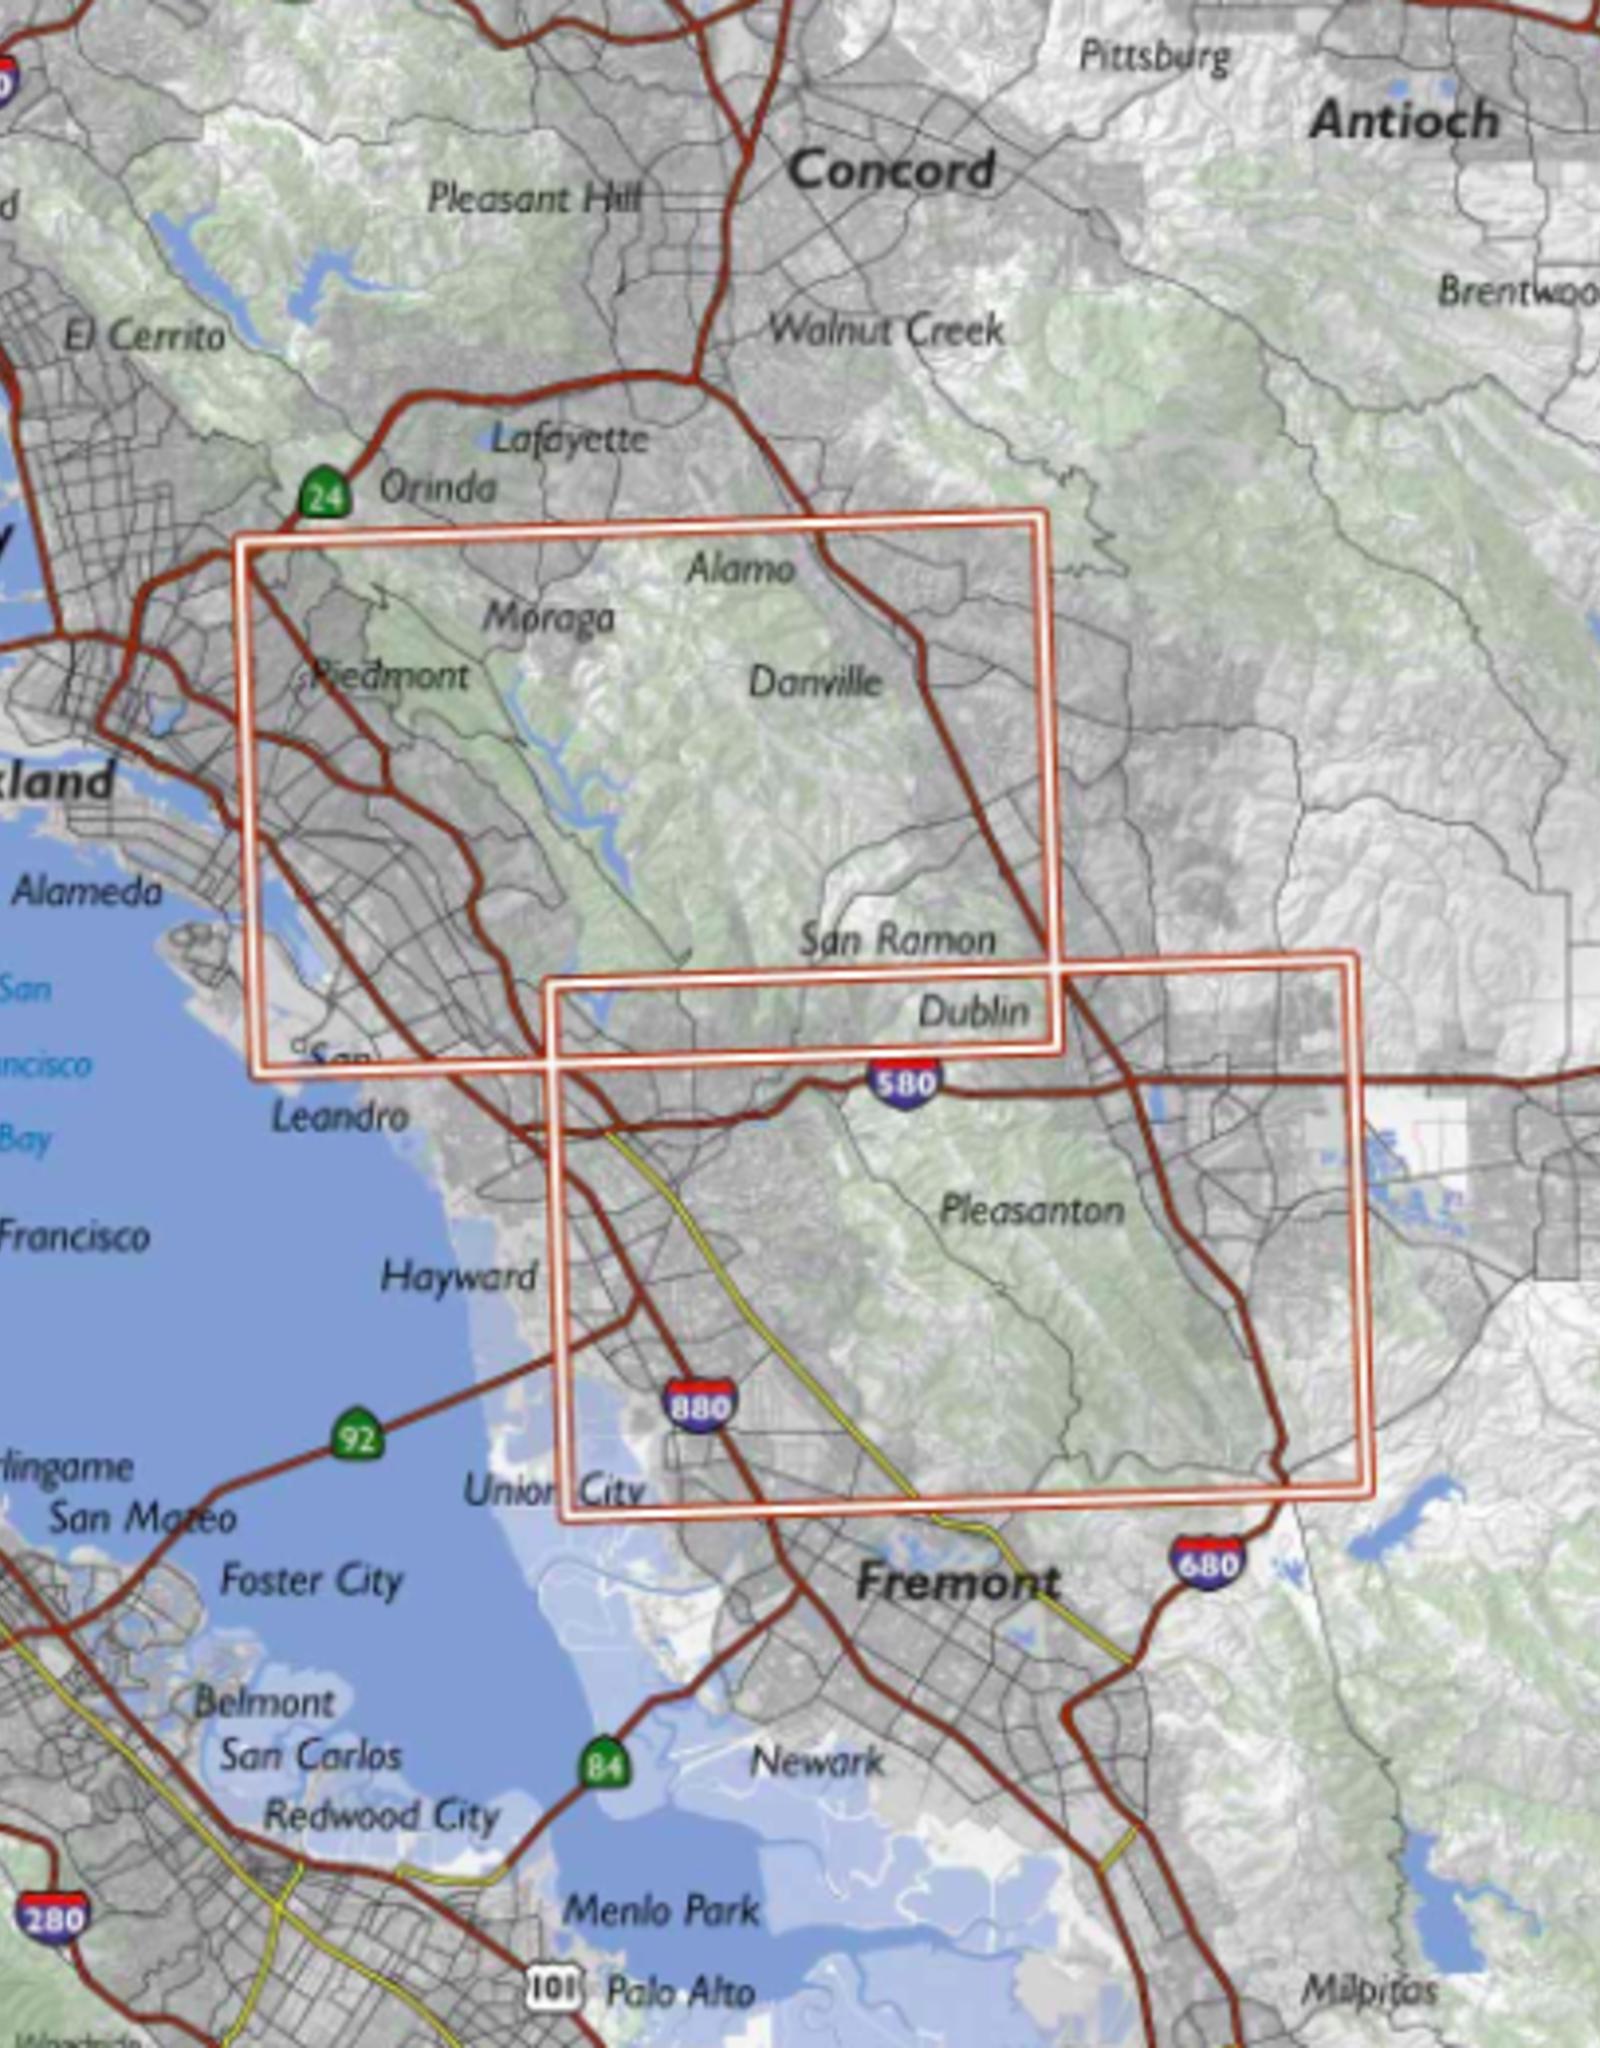 Bay Area Trail Map: Oakland Hills and Pleasanton Ridge